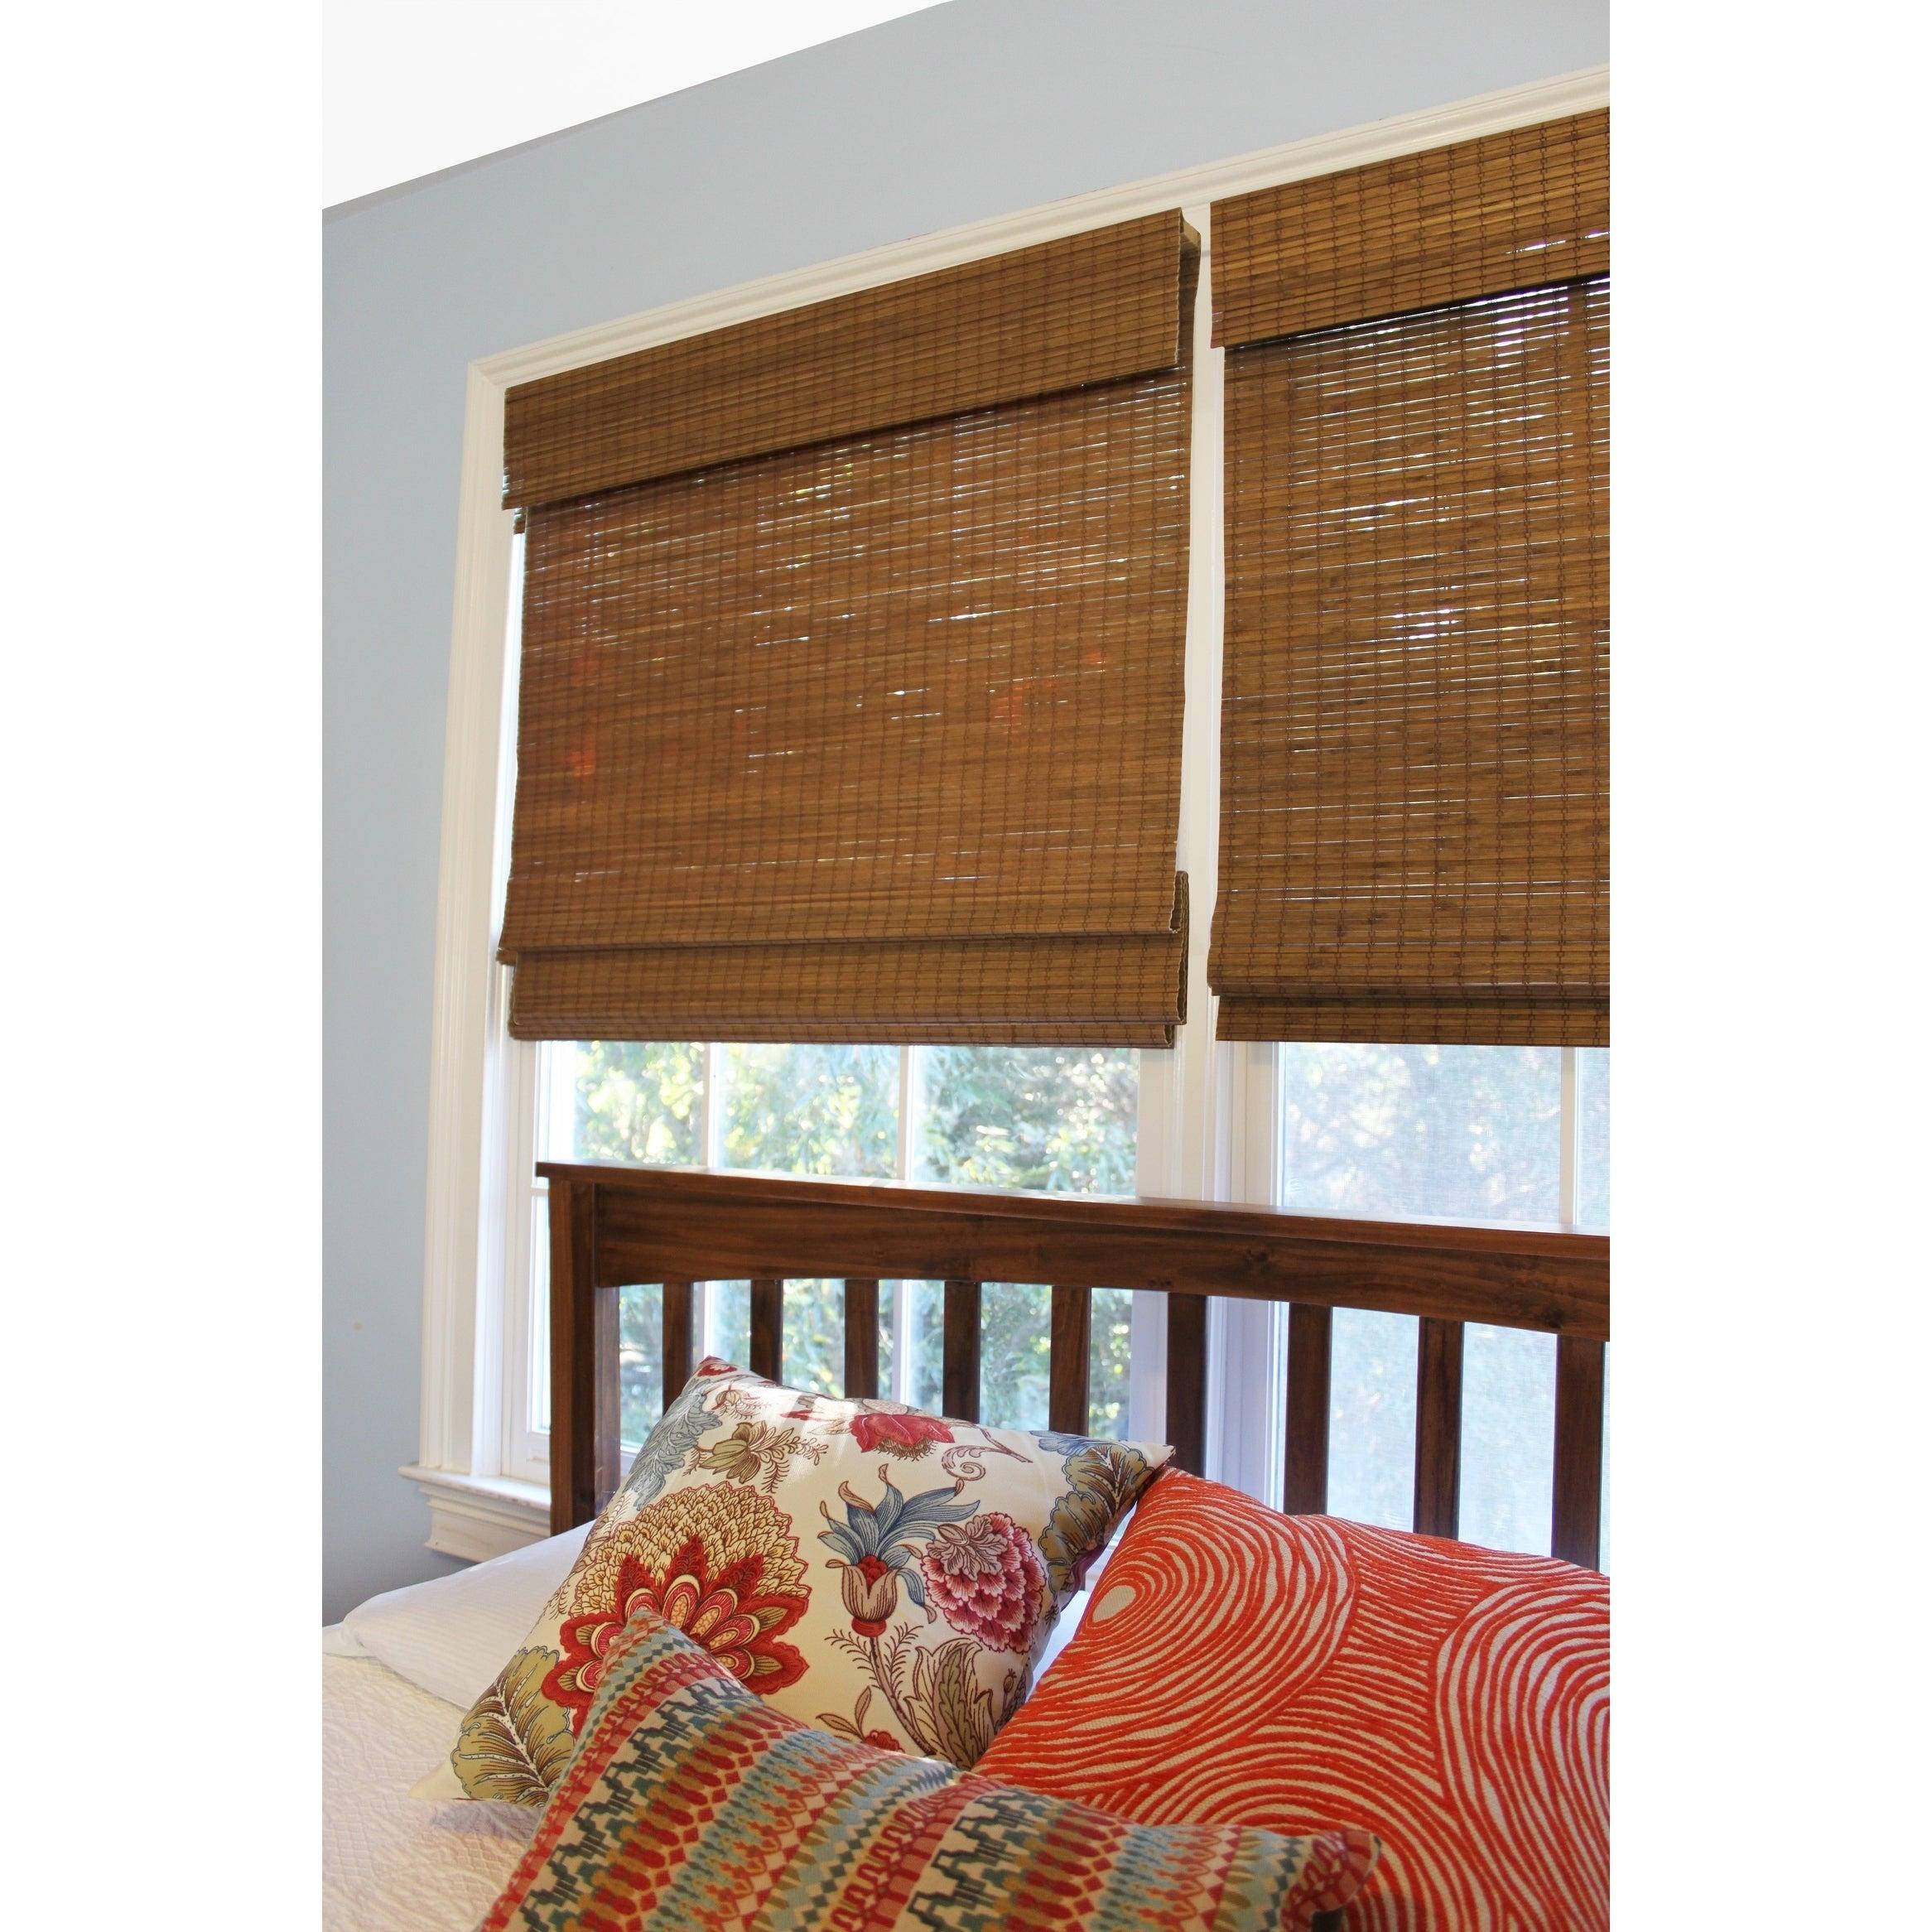 Radiance Cordless Maple Cape Cod Flatweave Bamboo Roman Shade On Sale Overstock 24313630